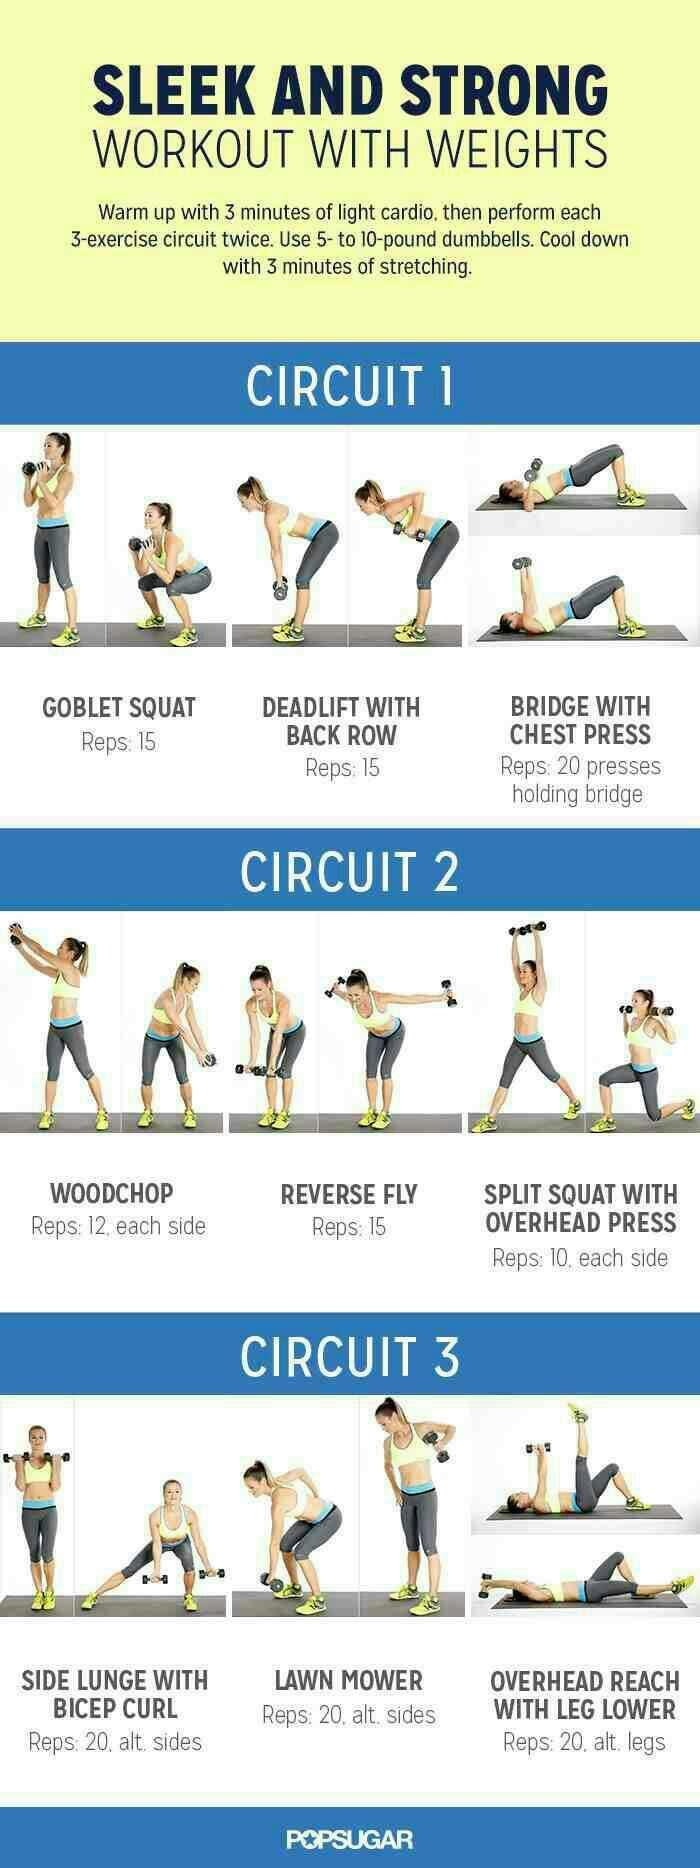 Sleek and Slender workout #Health #Fitness #Tip